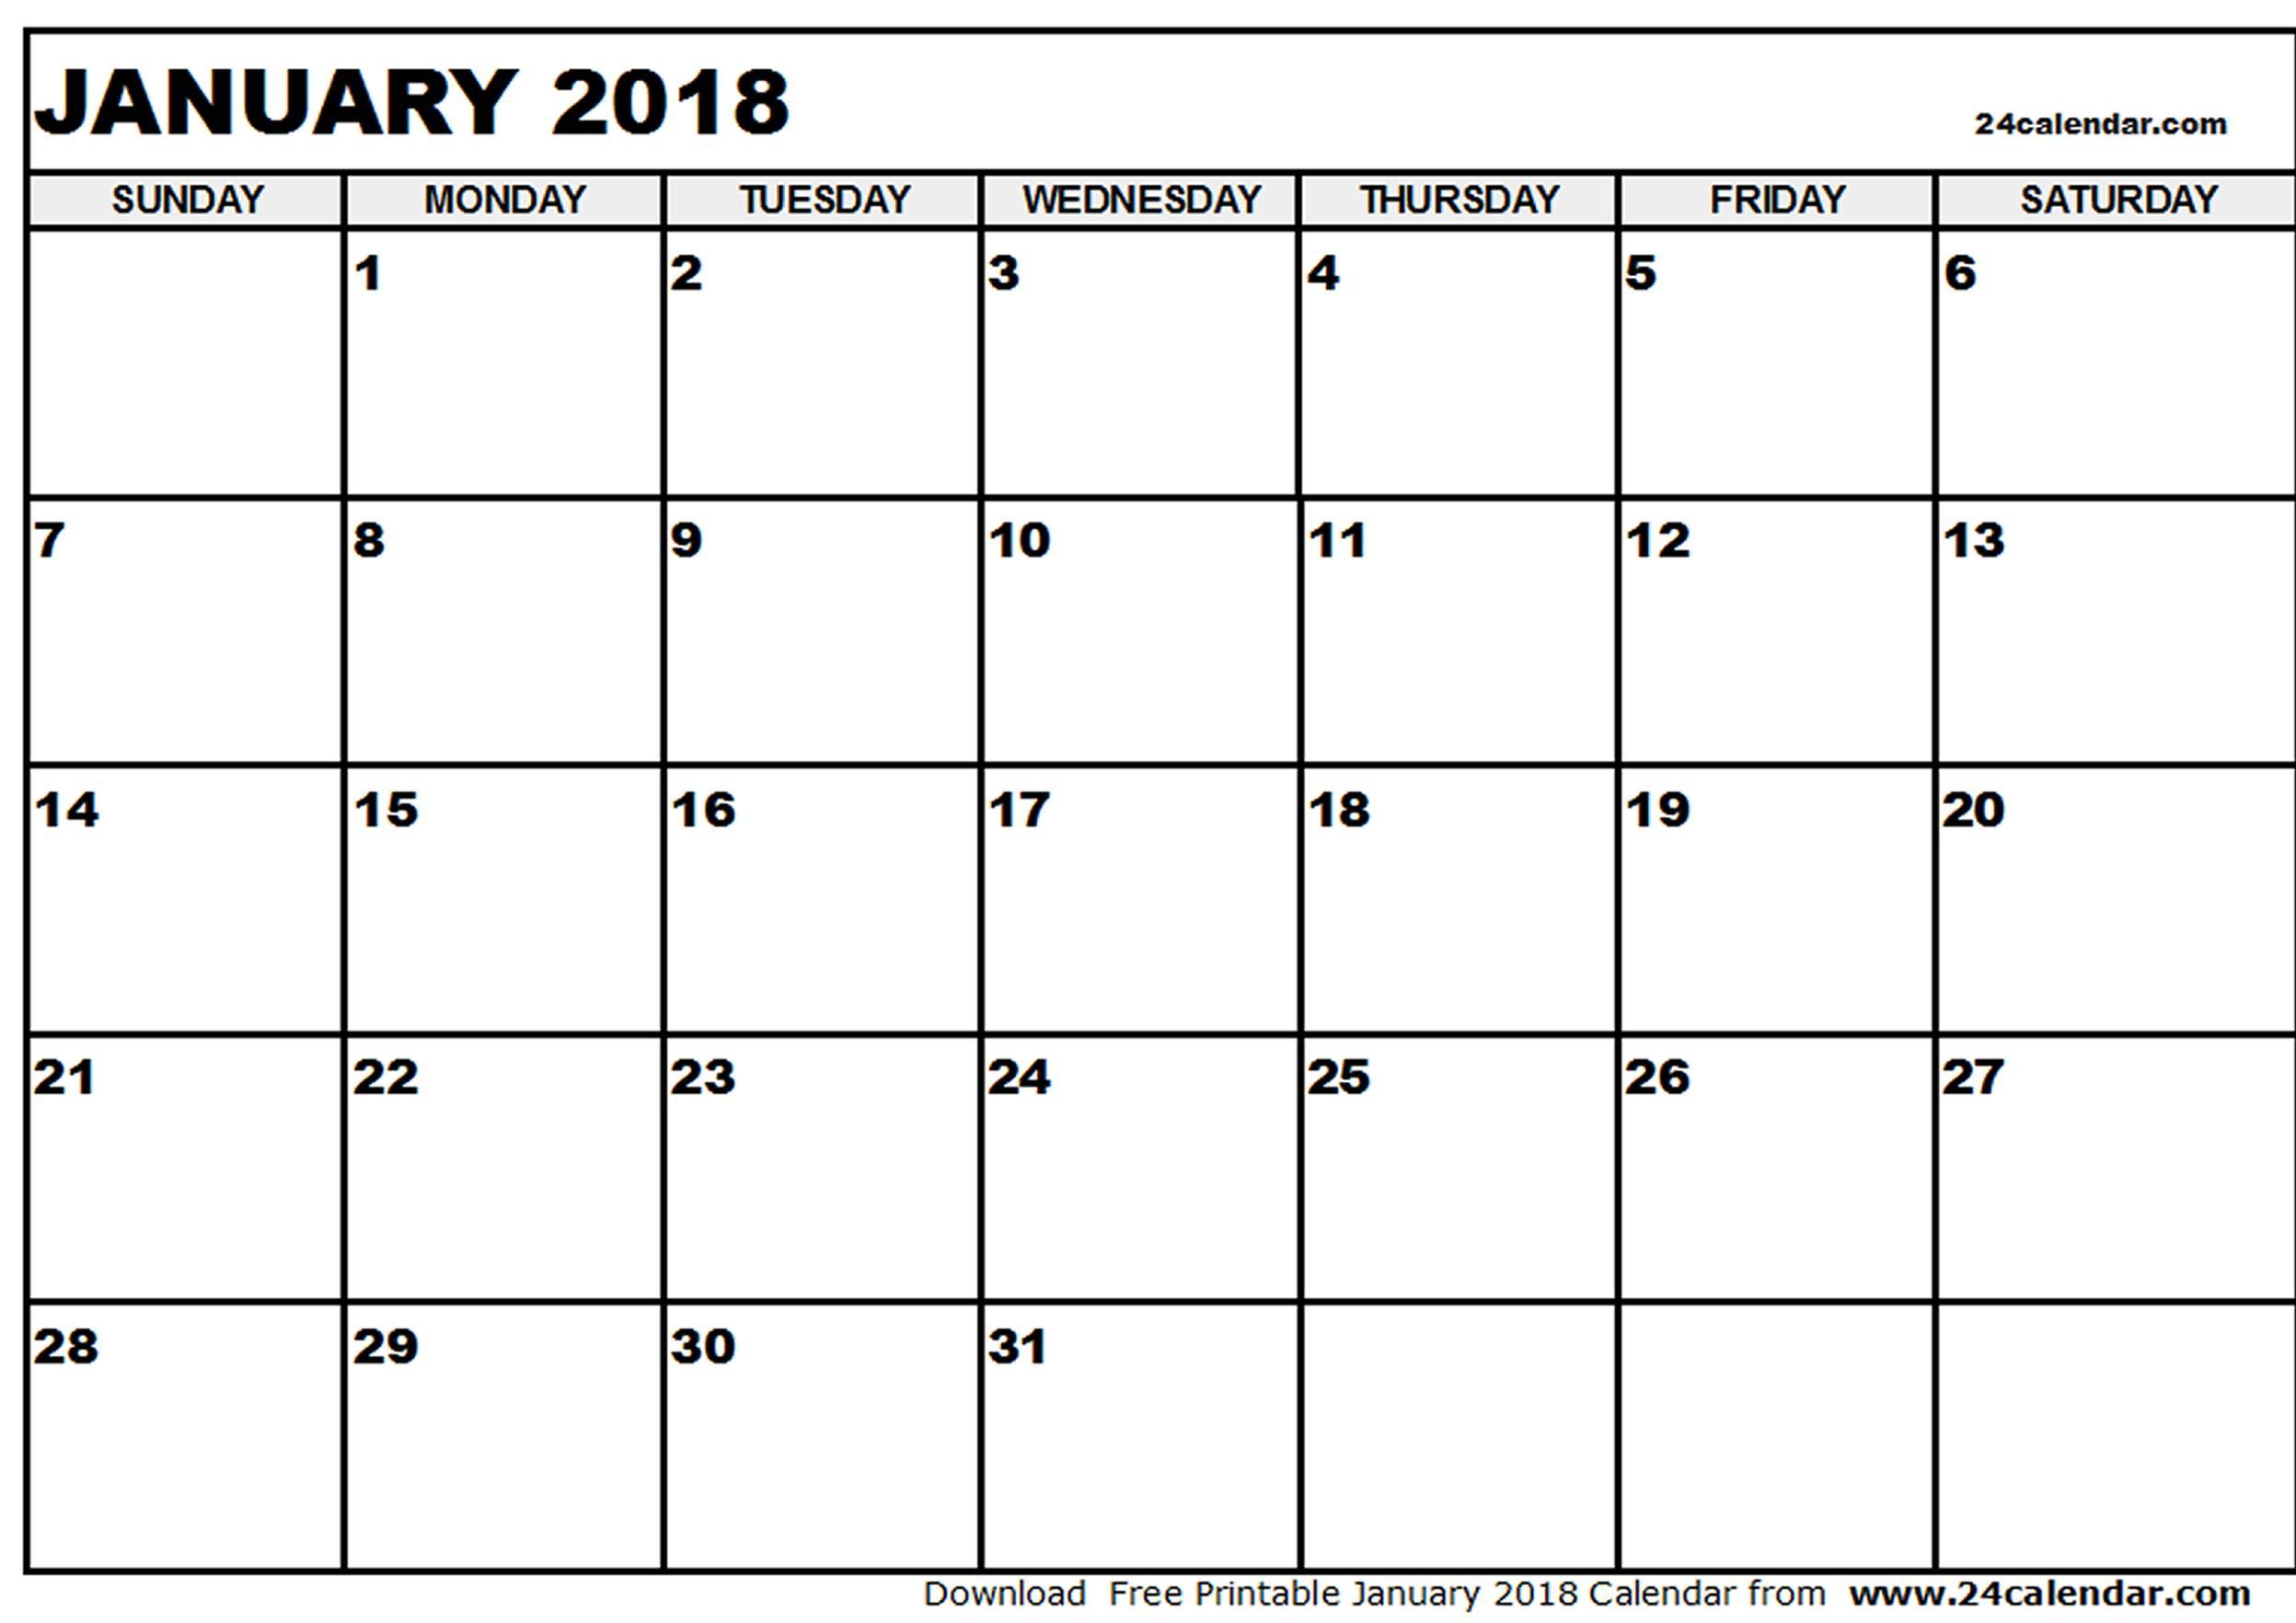 Blank January 2018 Calendar in Printable format.